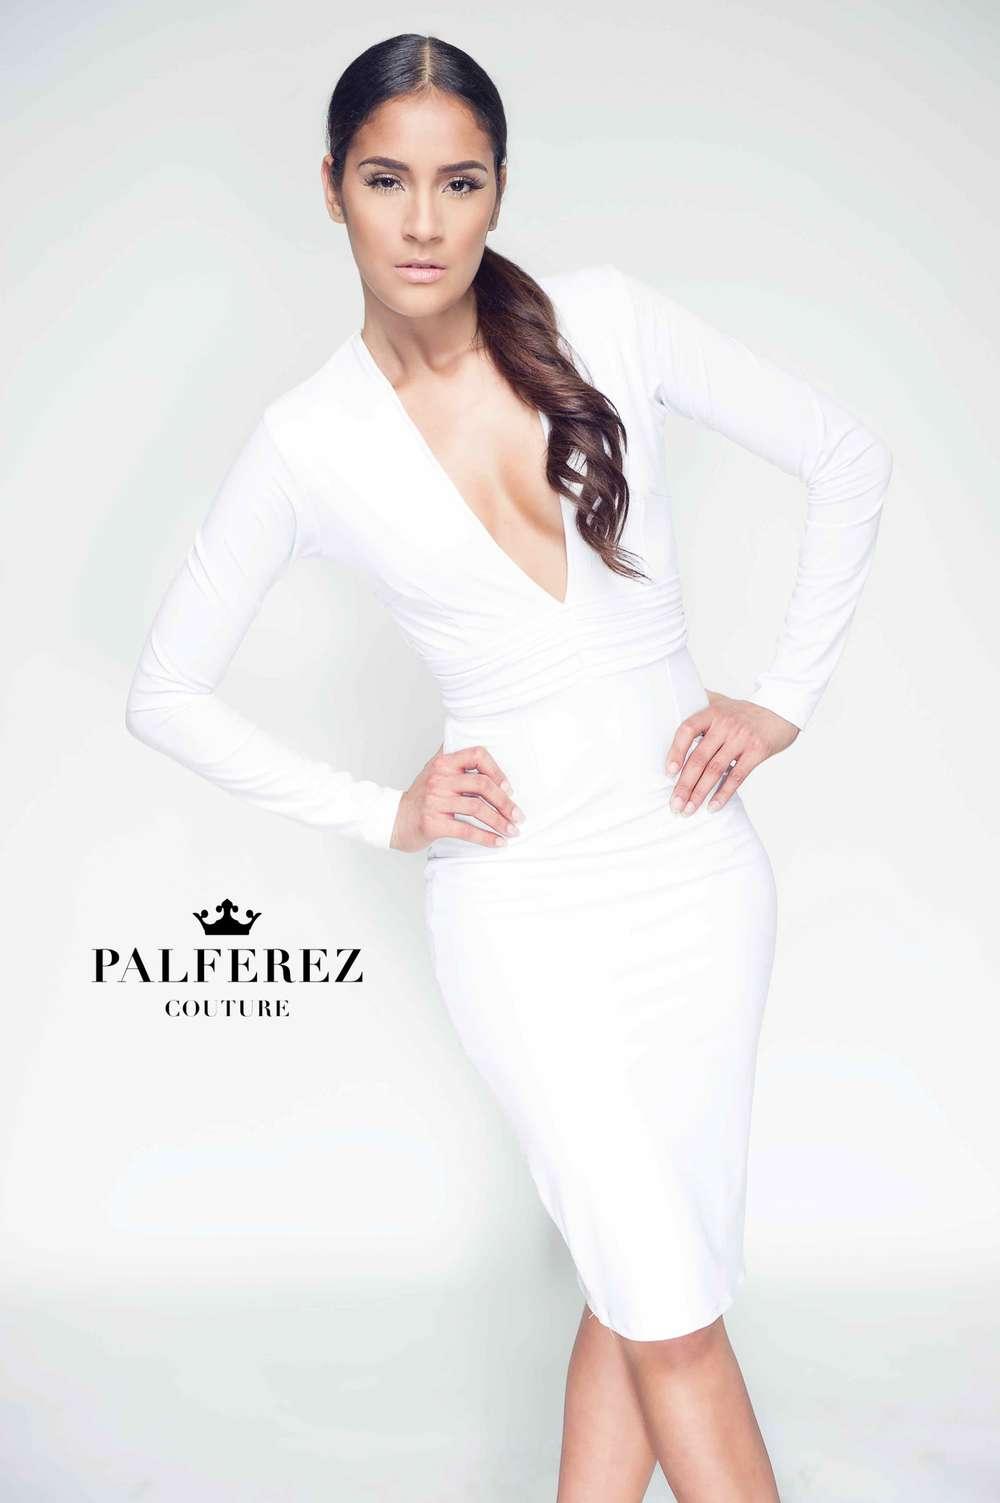 Manuel-Palferez-Photoshoot-1060.jpg